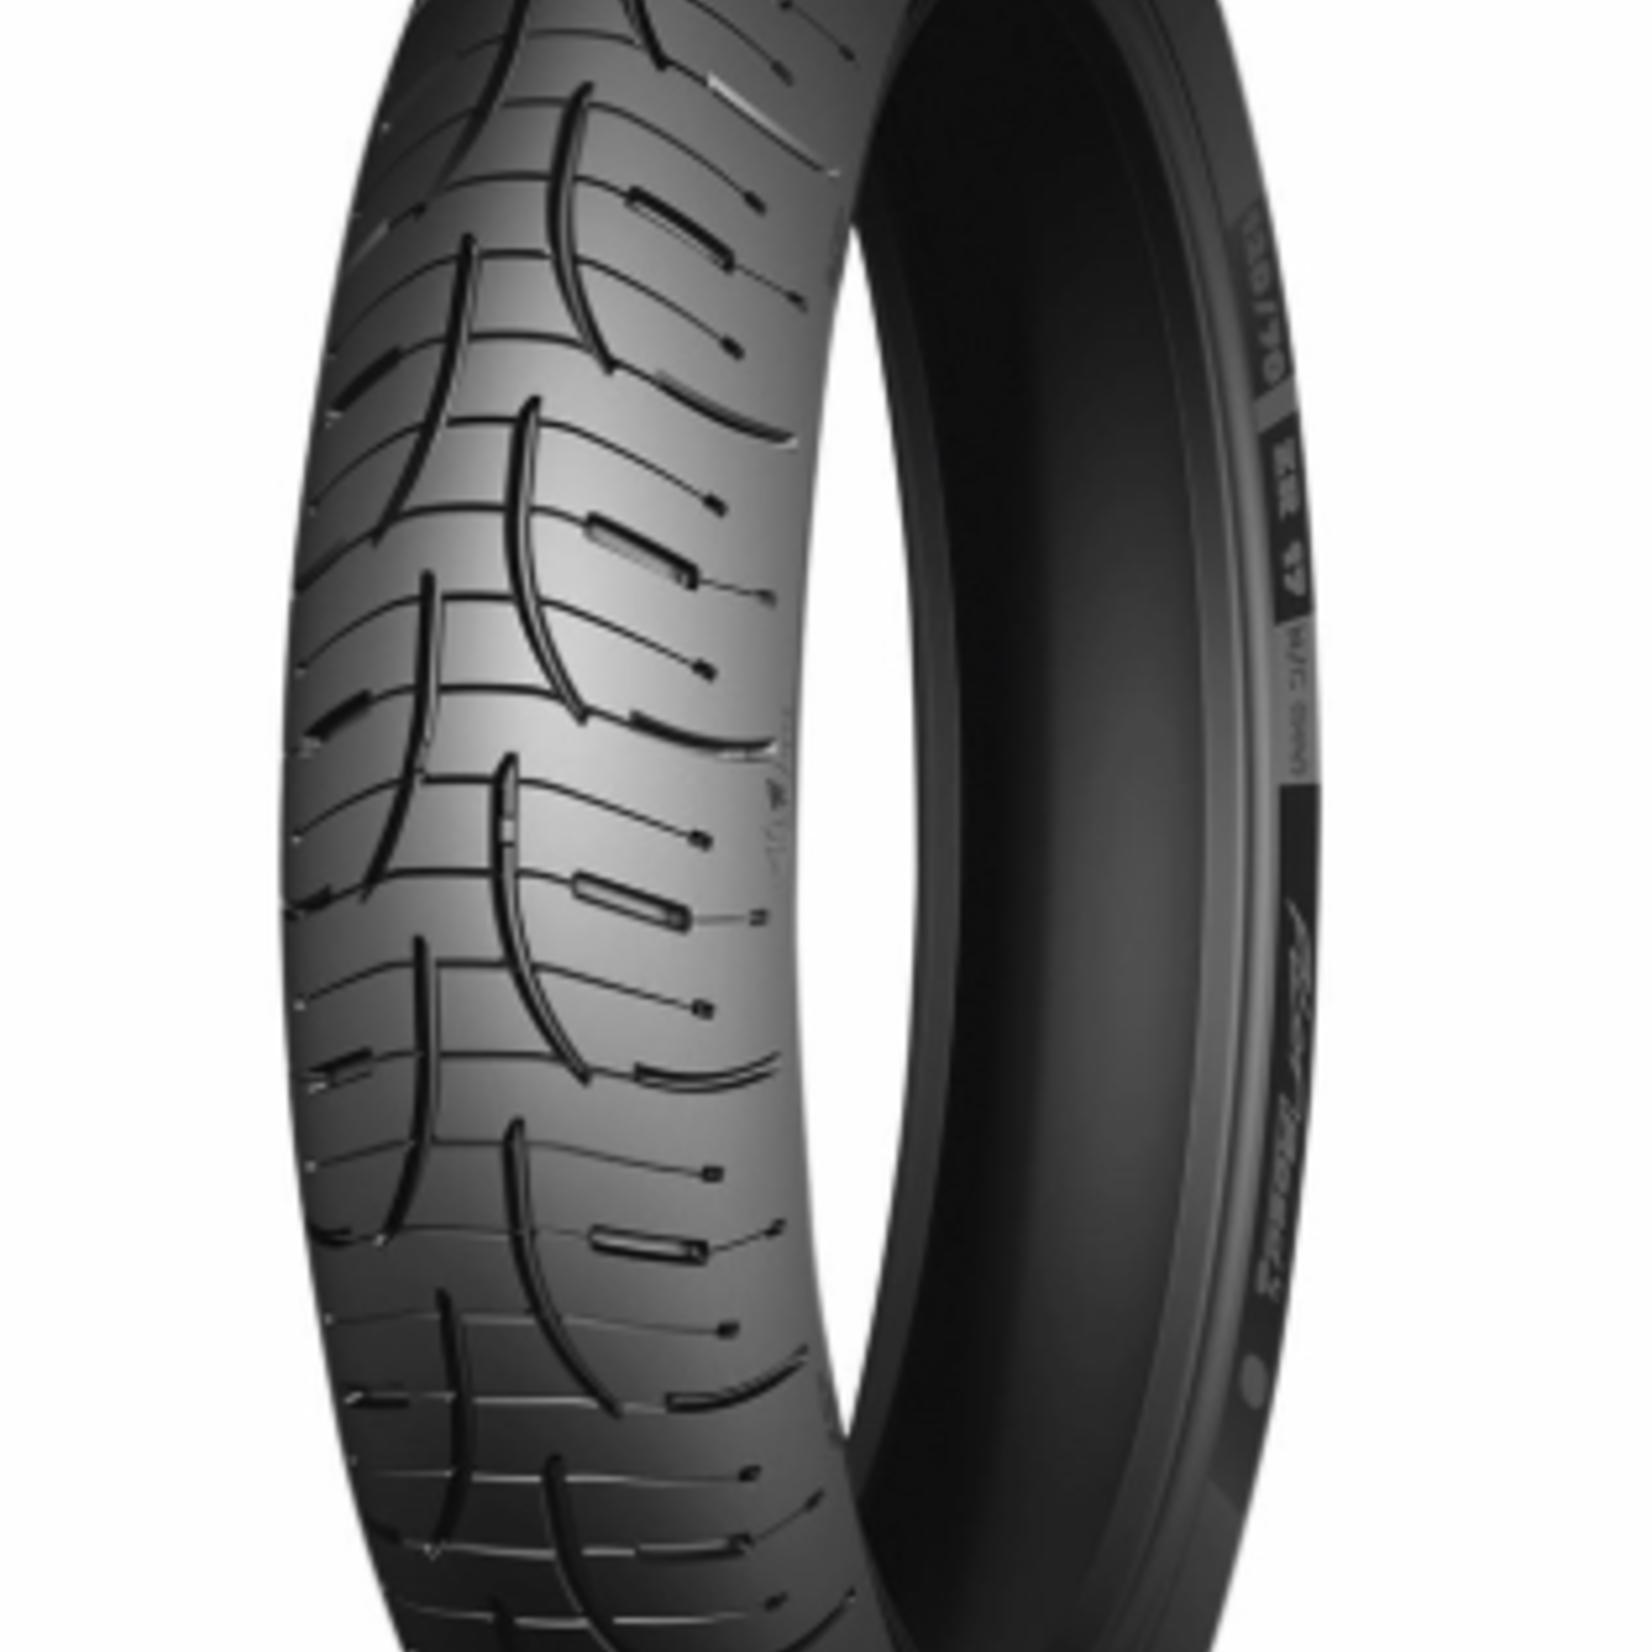 Michelin Michelin Pilot Road 4 GT Front Tire - 120/70-17